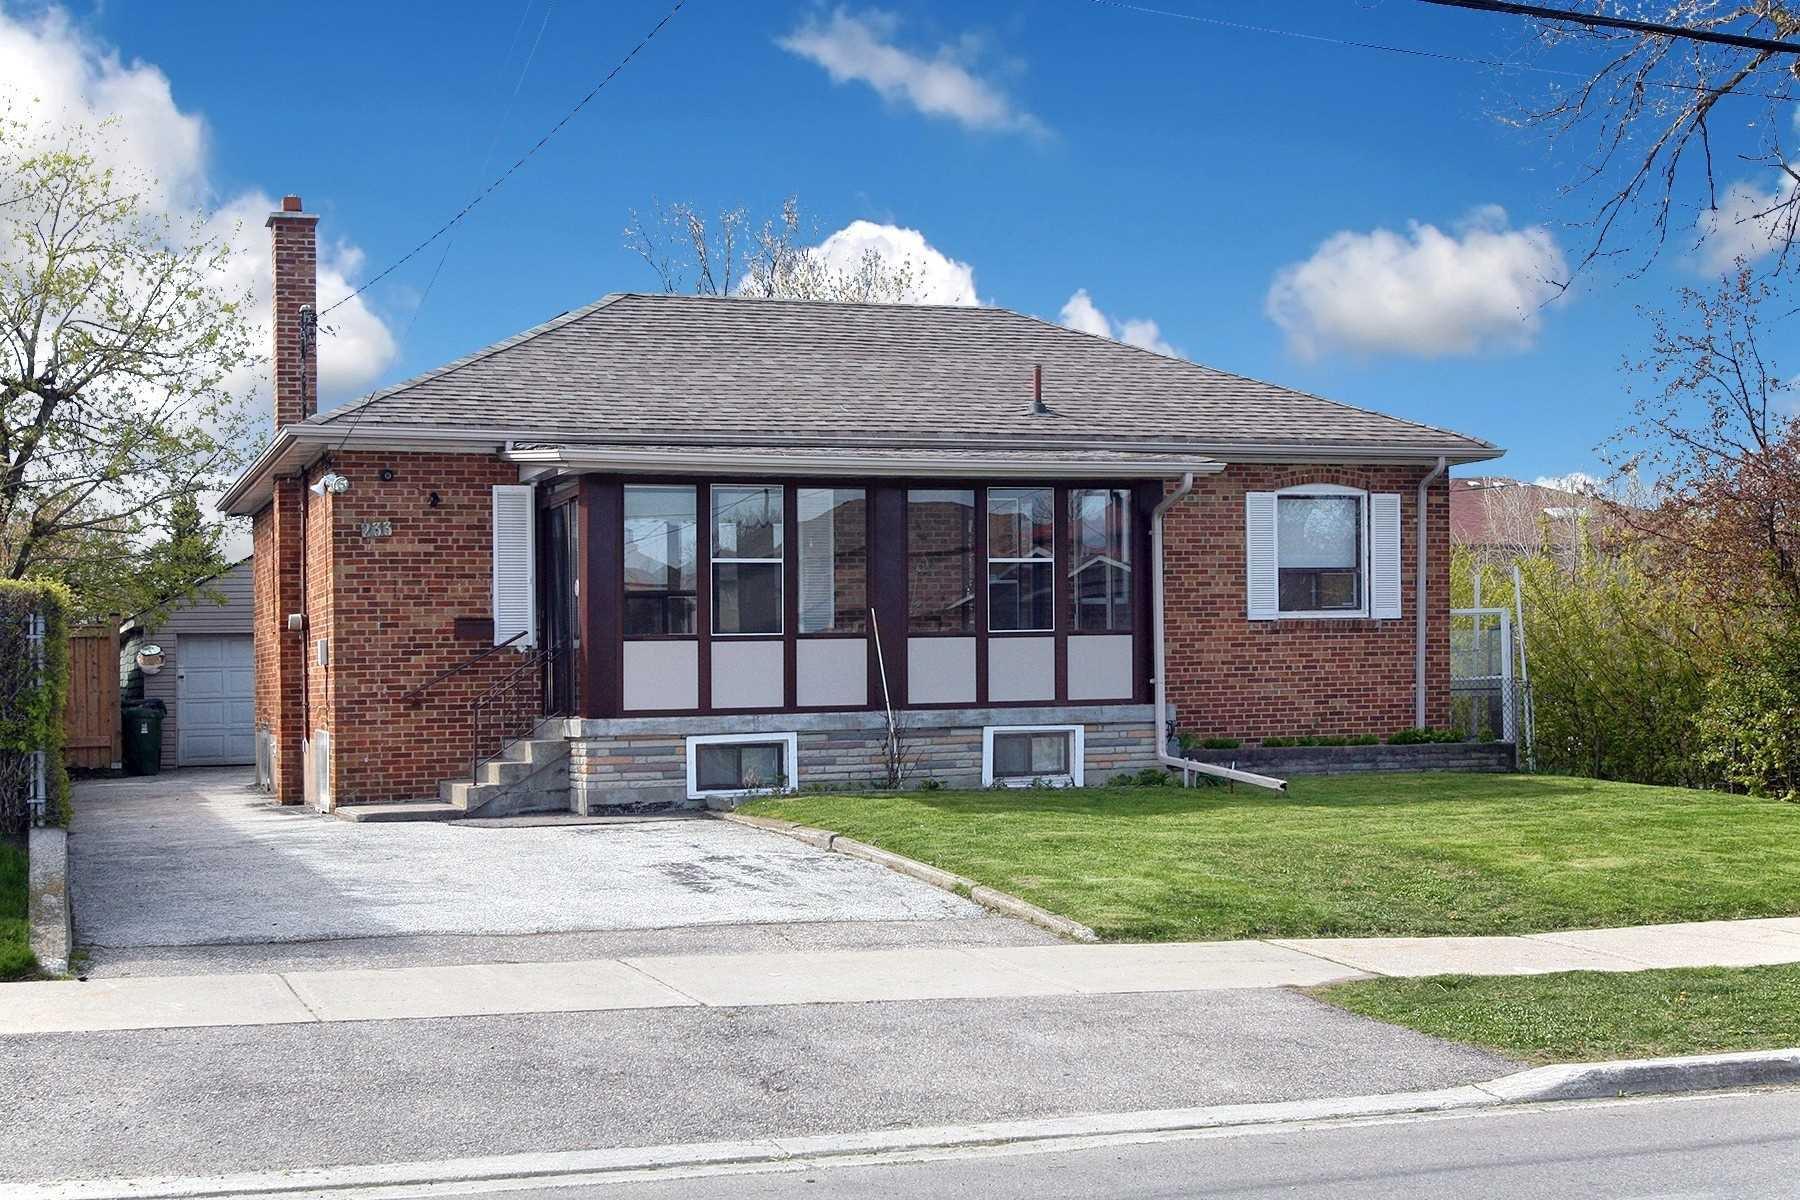 Main Photo: 233 Falstaff Avenue in Toronto: Maple Leaf House (Bungalow) for sale (Toronto W04)  : MLS®# W4815222